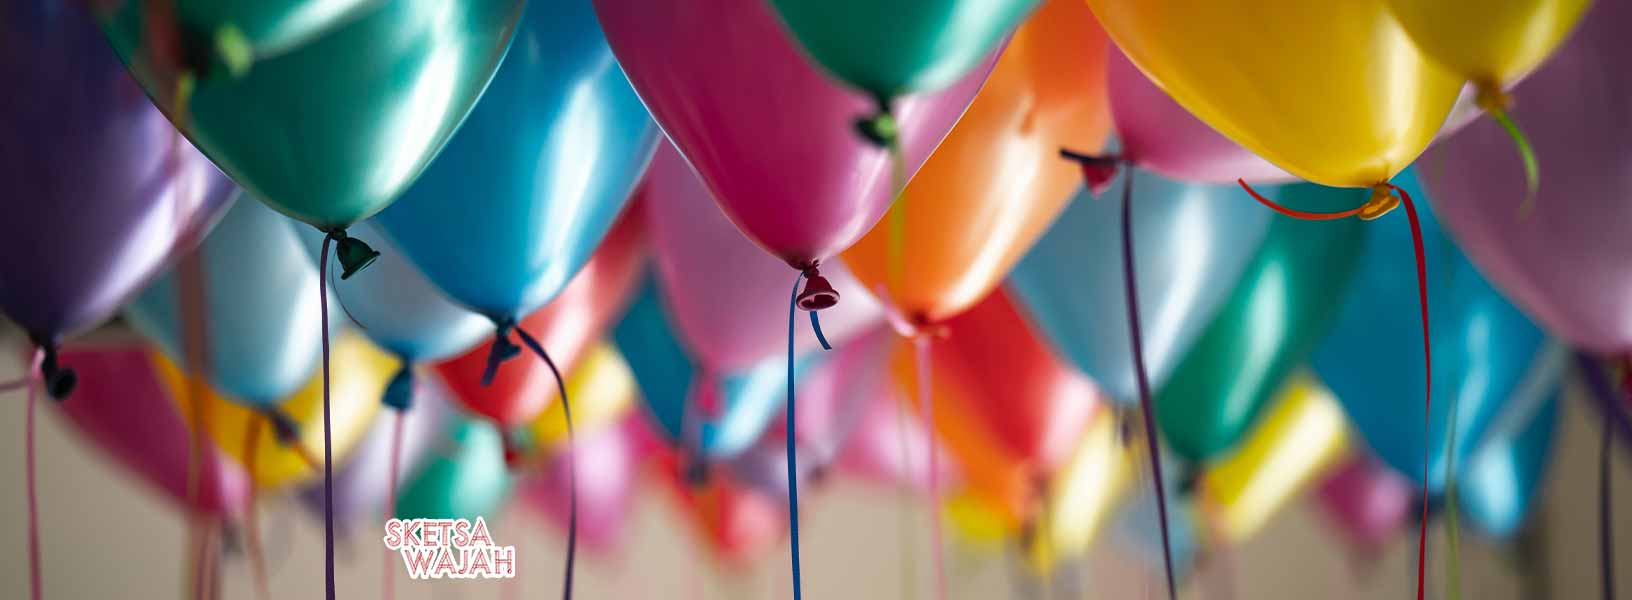 Kado Ulang Tahun untuk Sahabat Tersayang